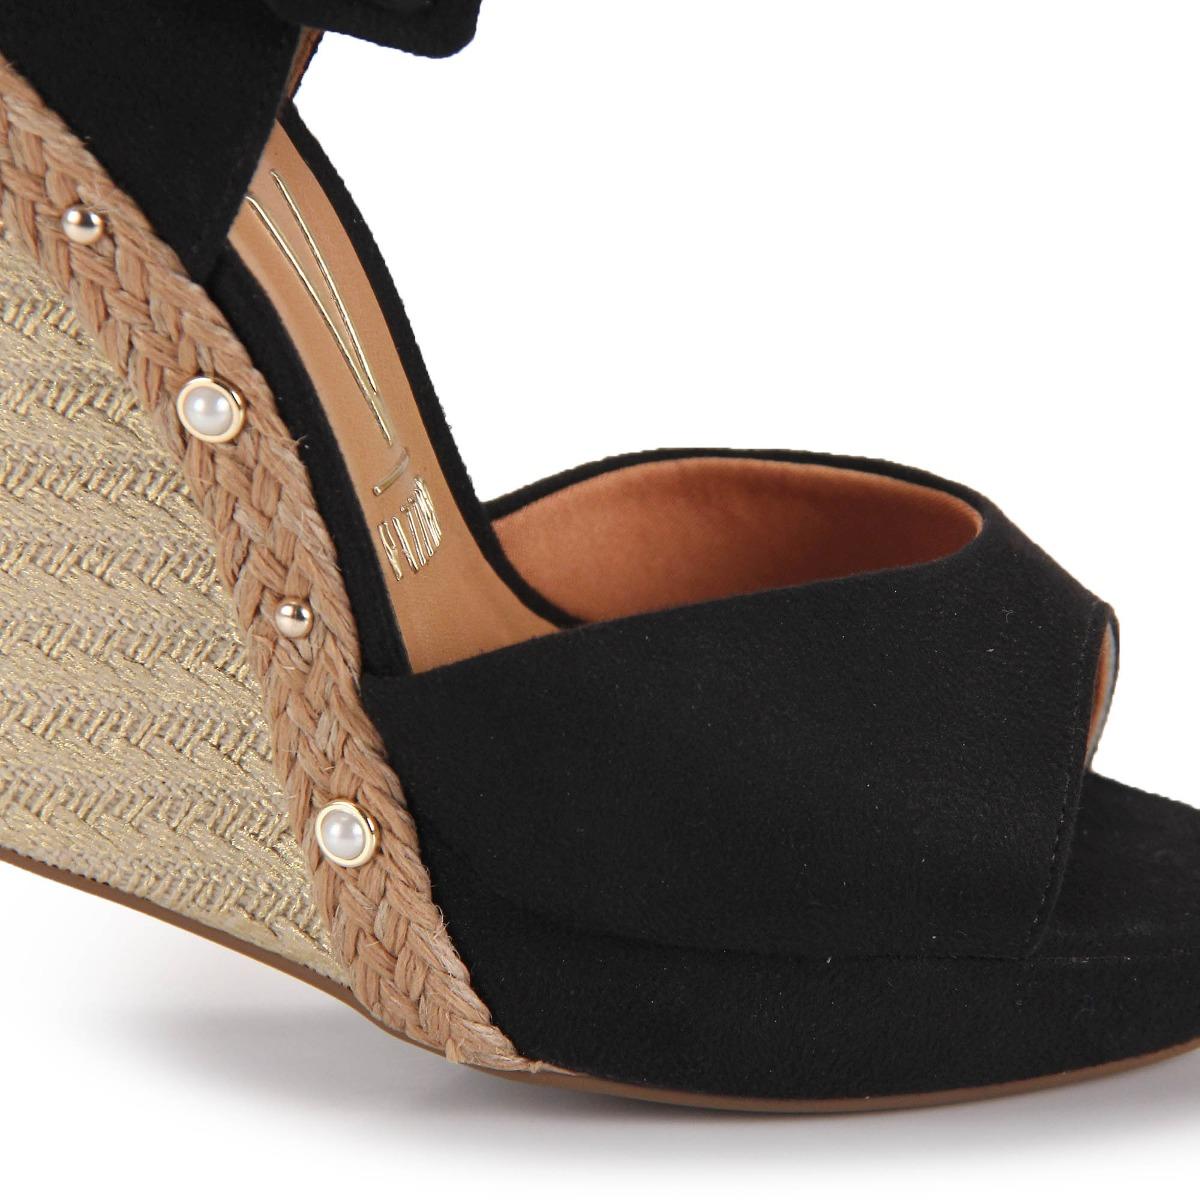 924431e2c sandália anabela espadrille vizzano pérola - preto. Carregando zoom.